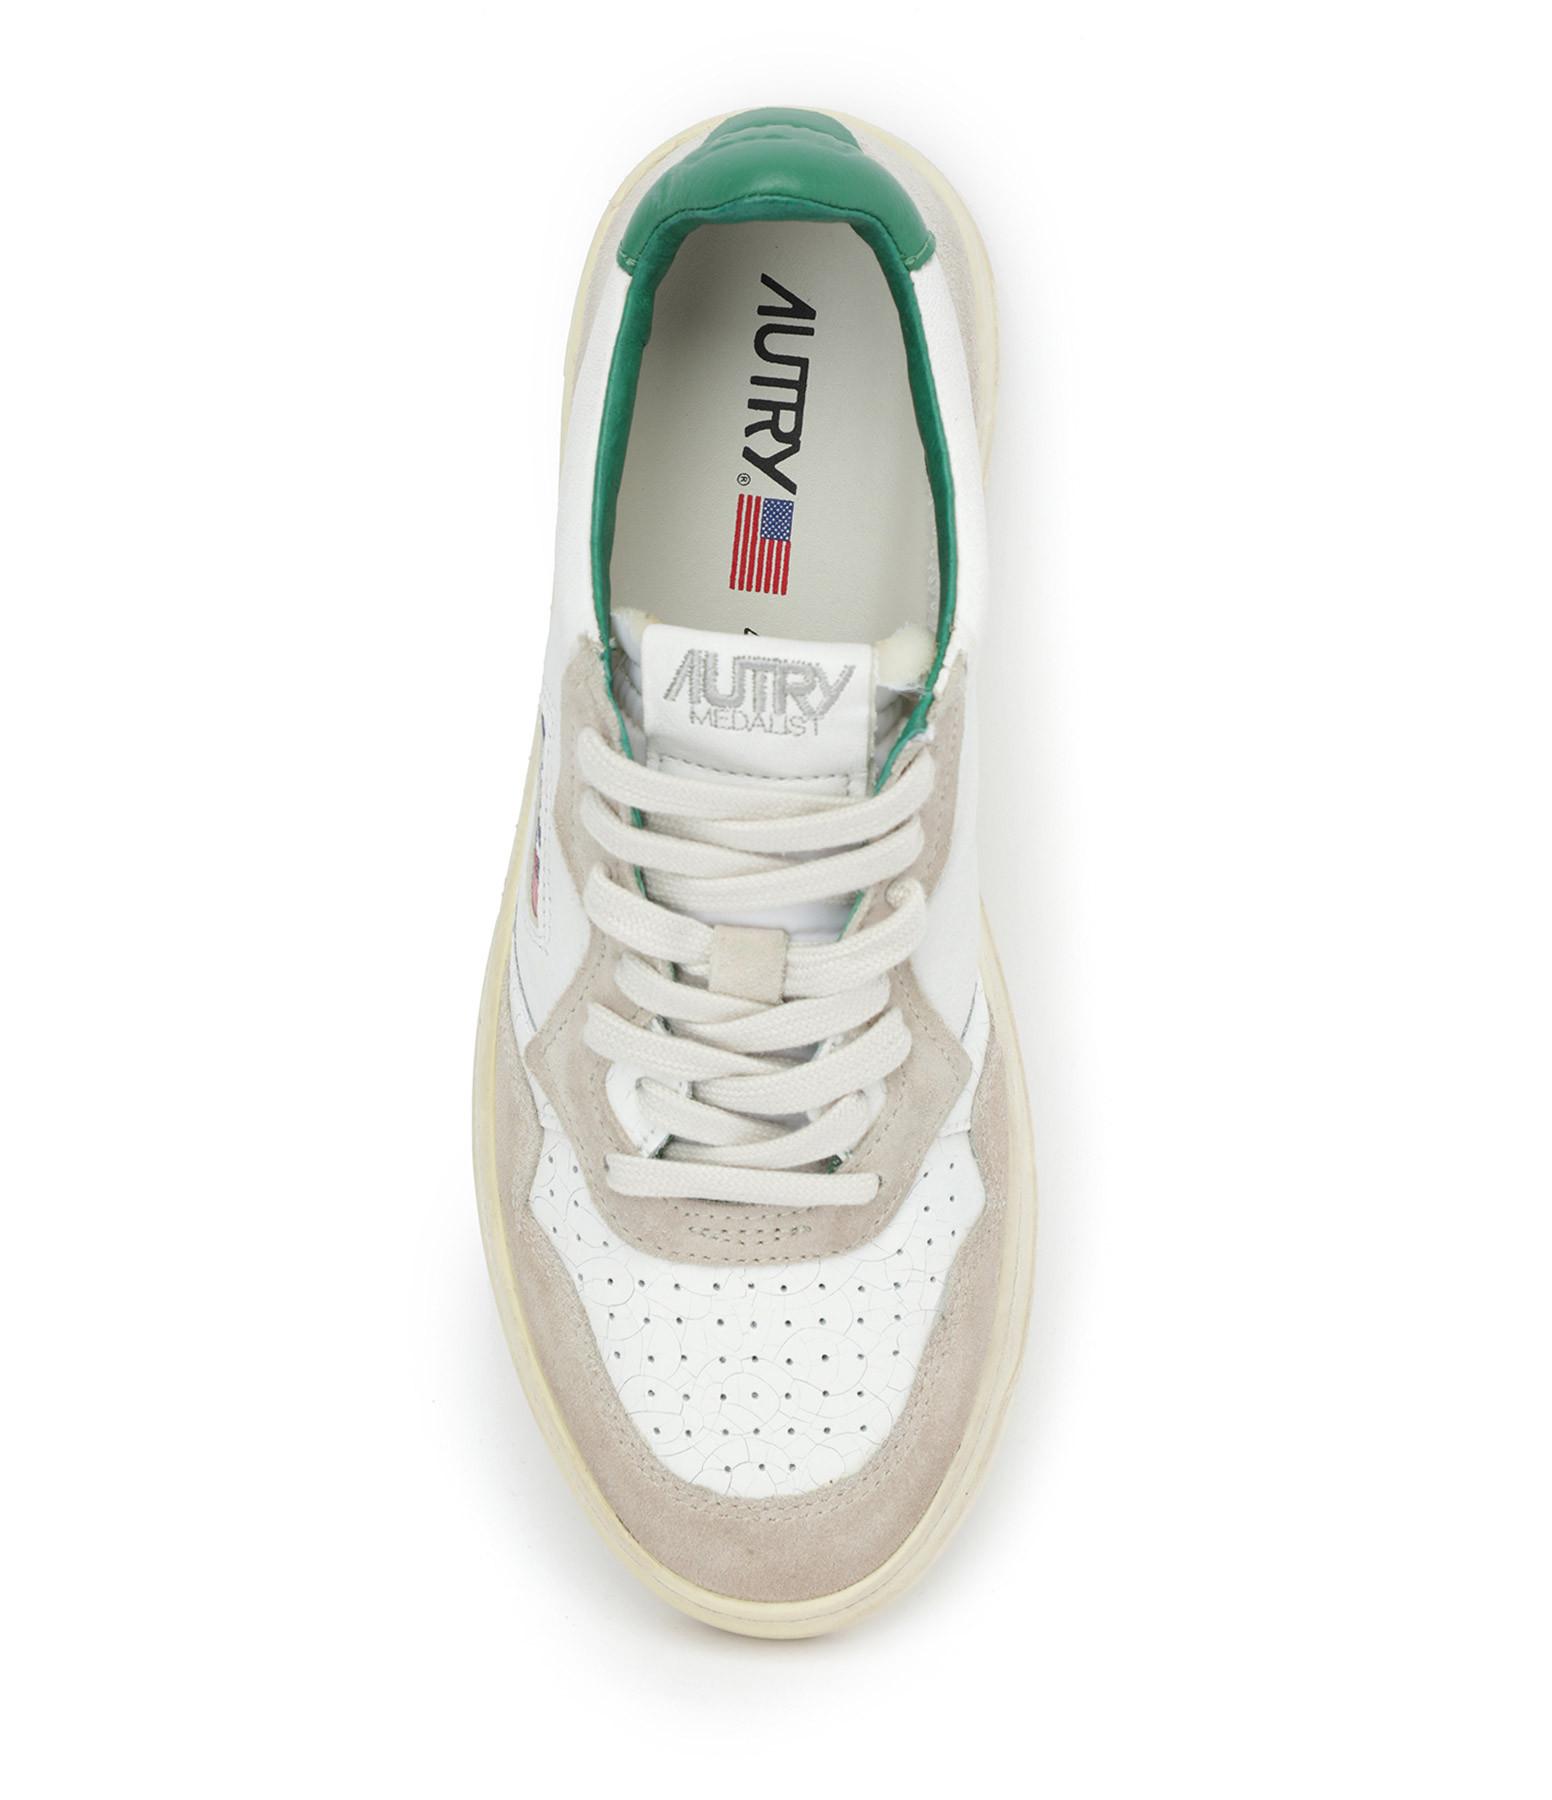 AUTRY - Baskets 01 Low Crack Blanc Vert